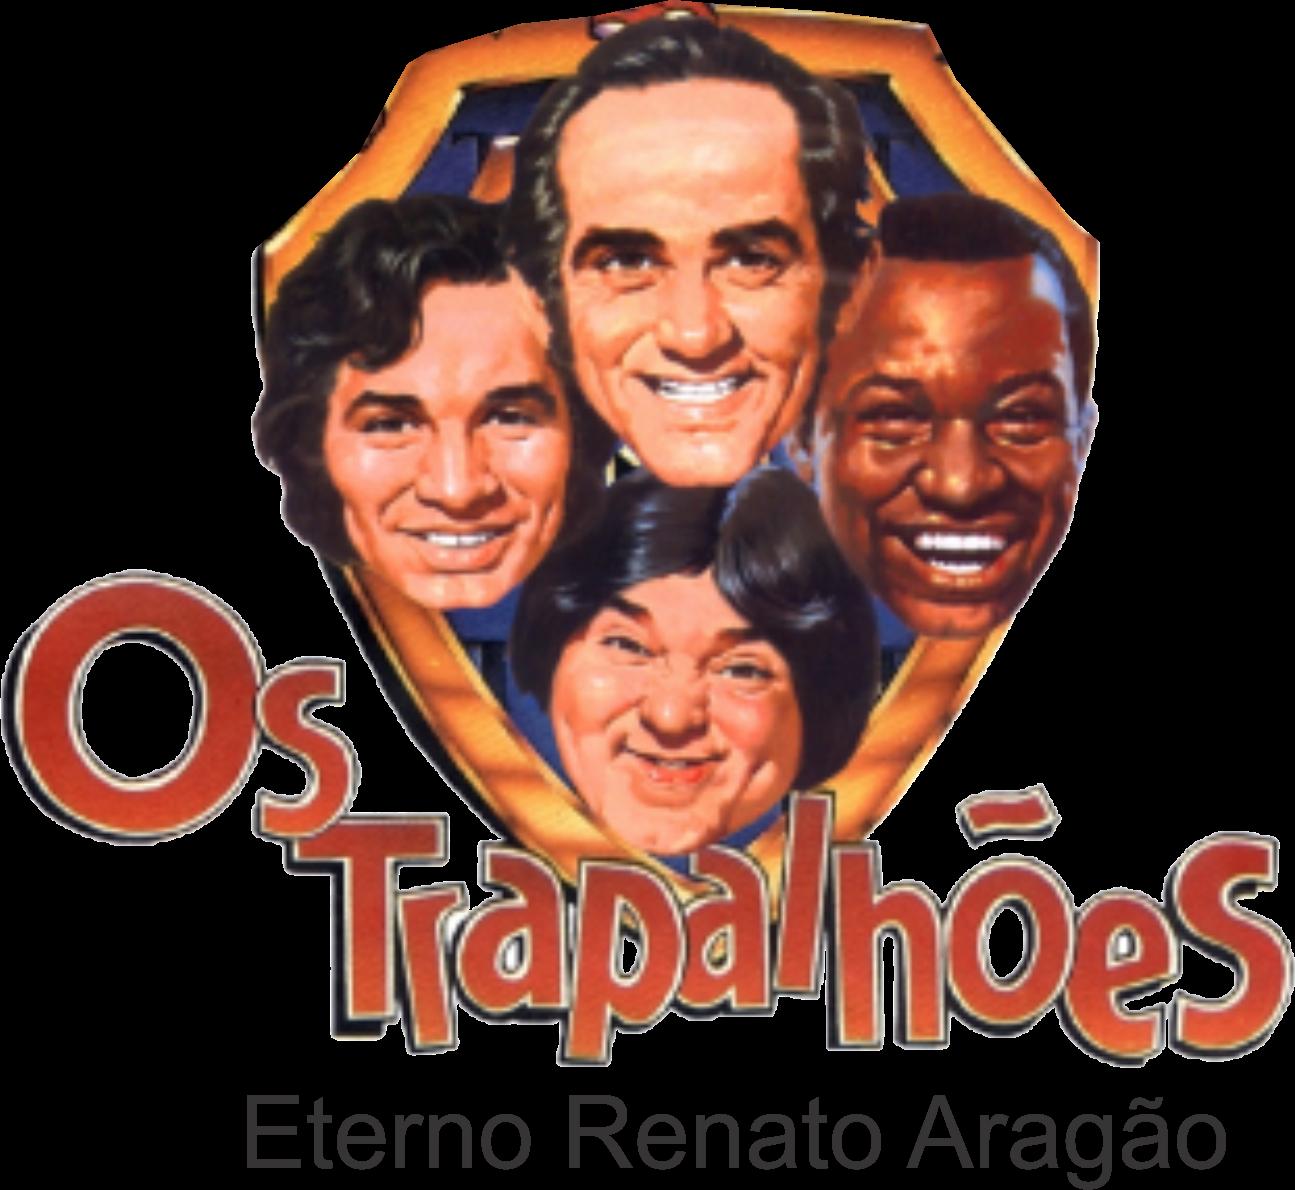 Eterno Renato Oficial - Os Trapalhões